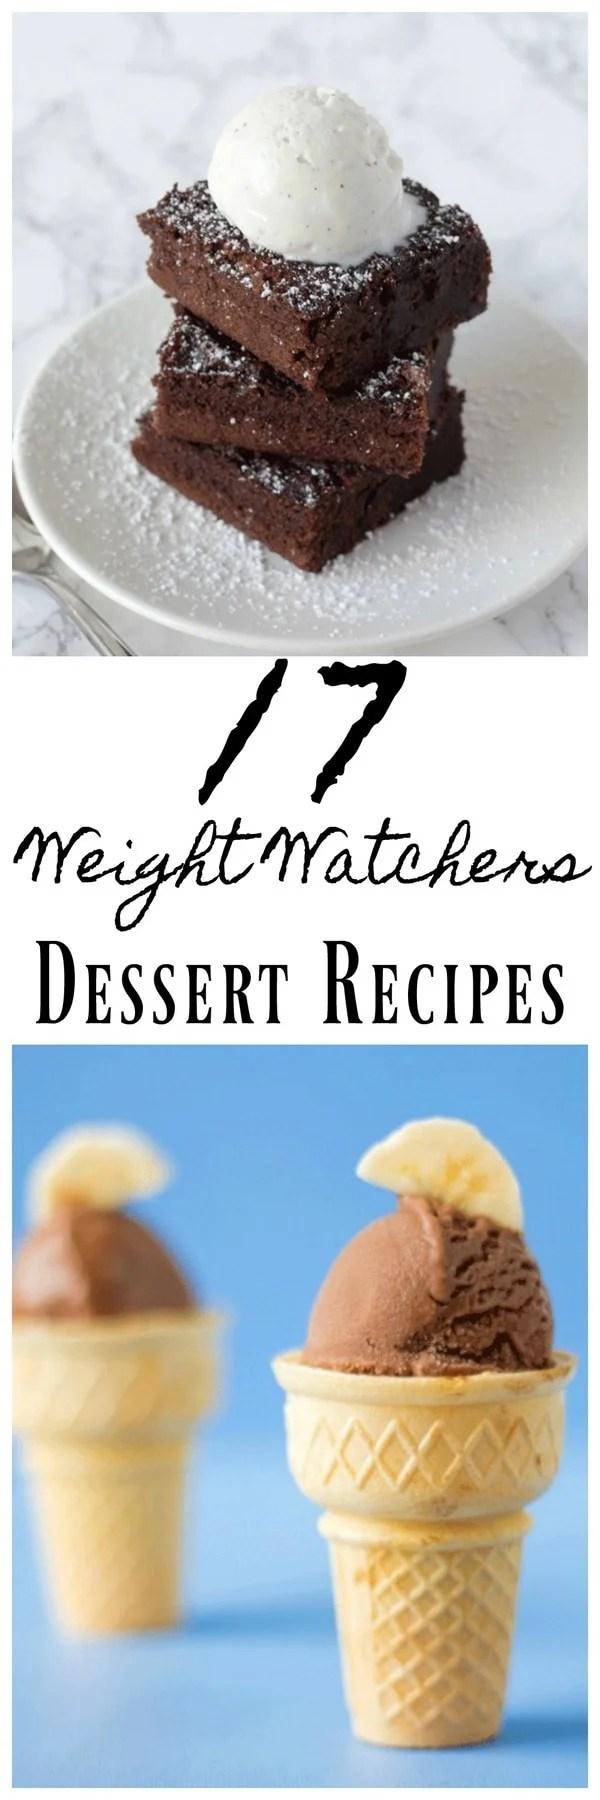 17 Weight Watchers Dessert Recipes Midgetmomma